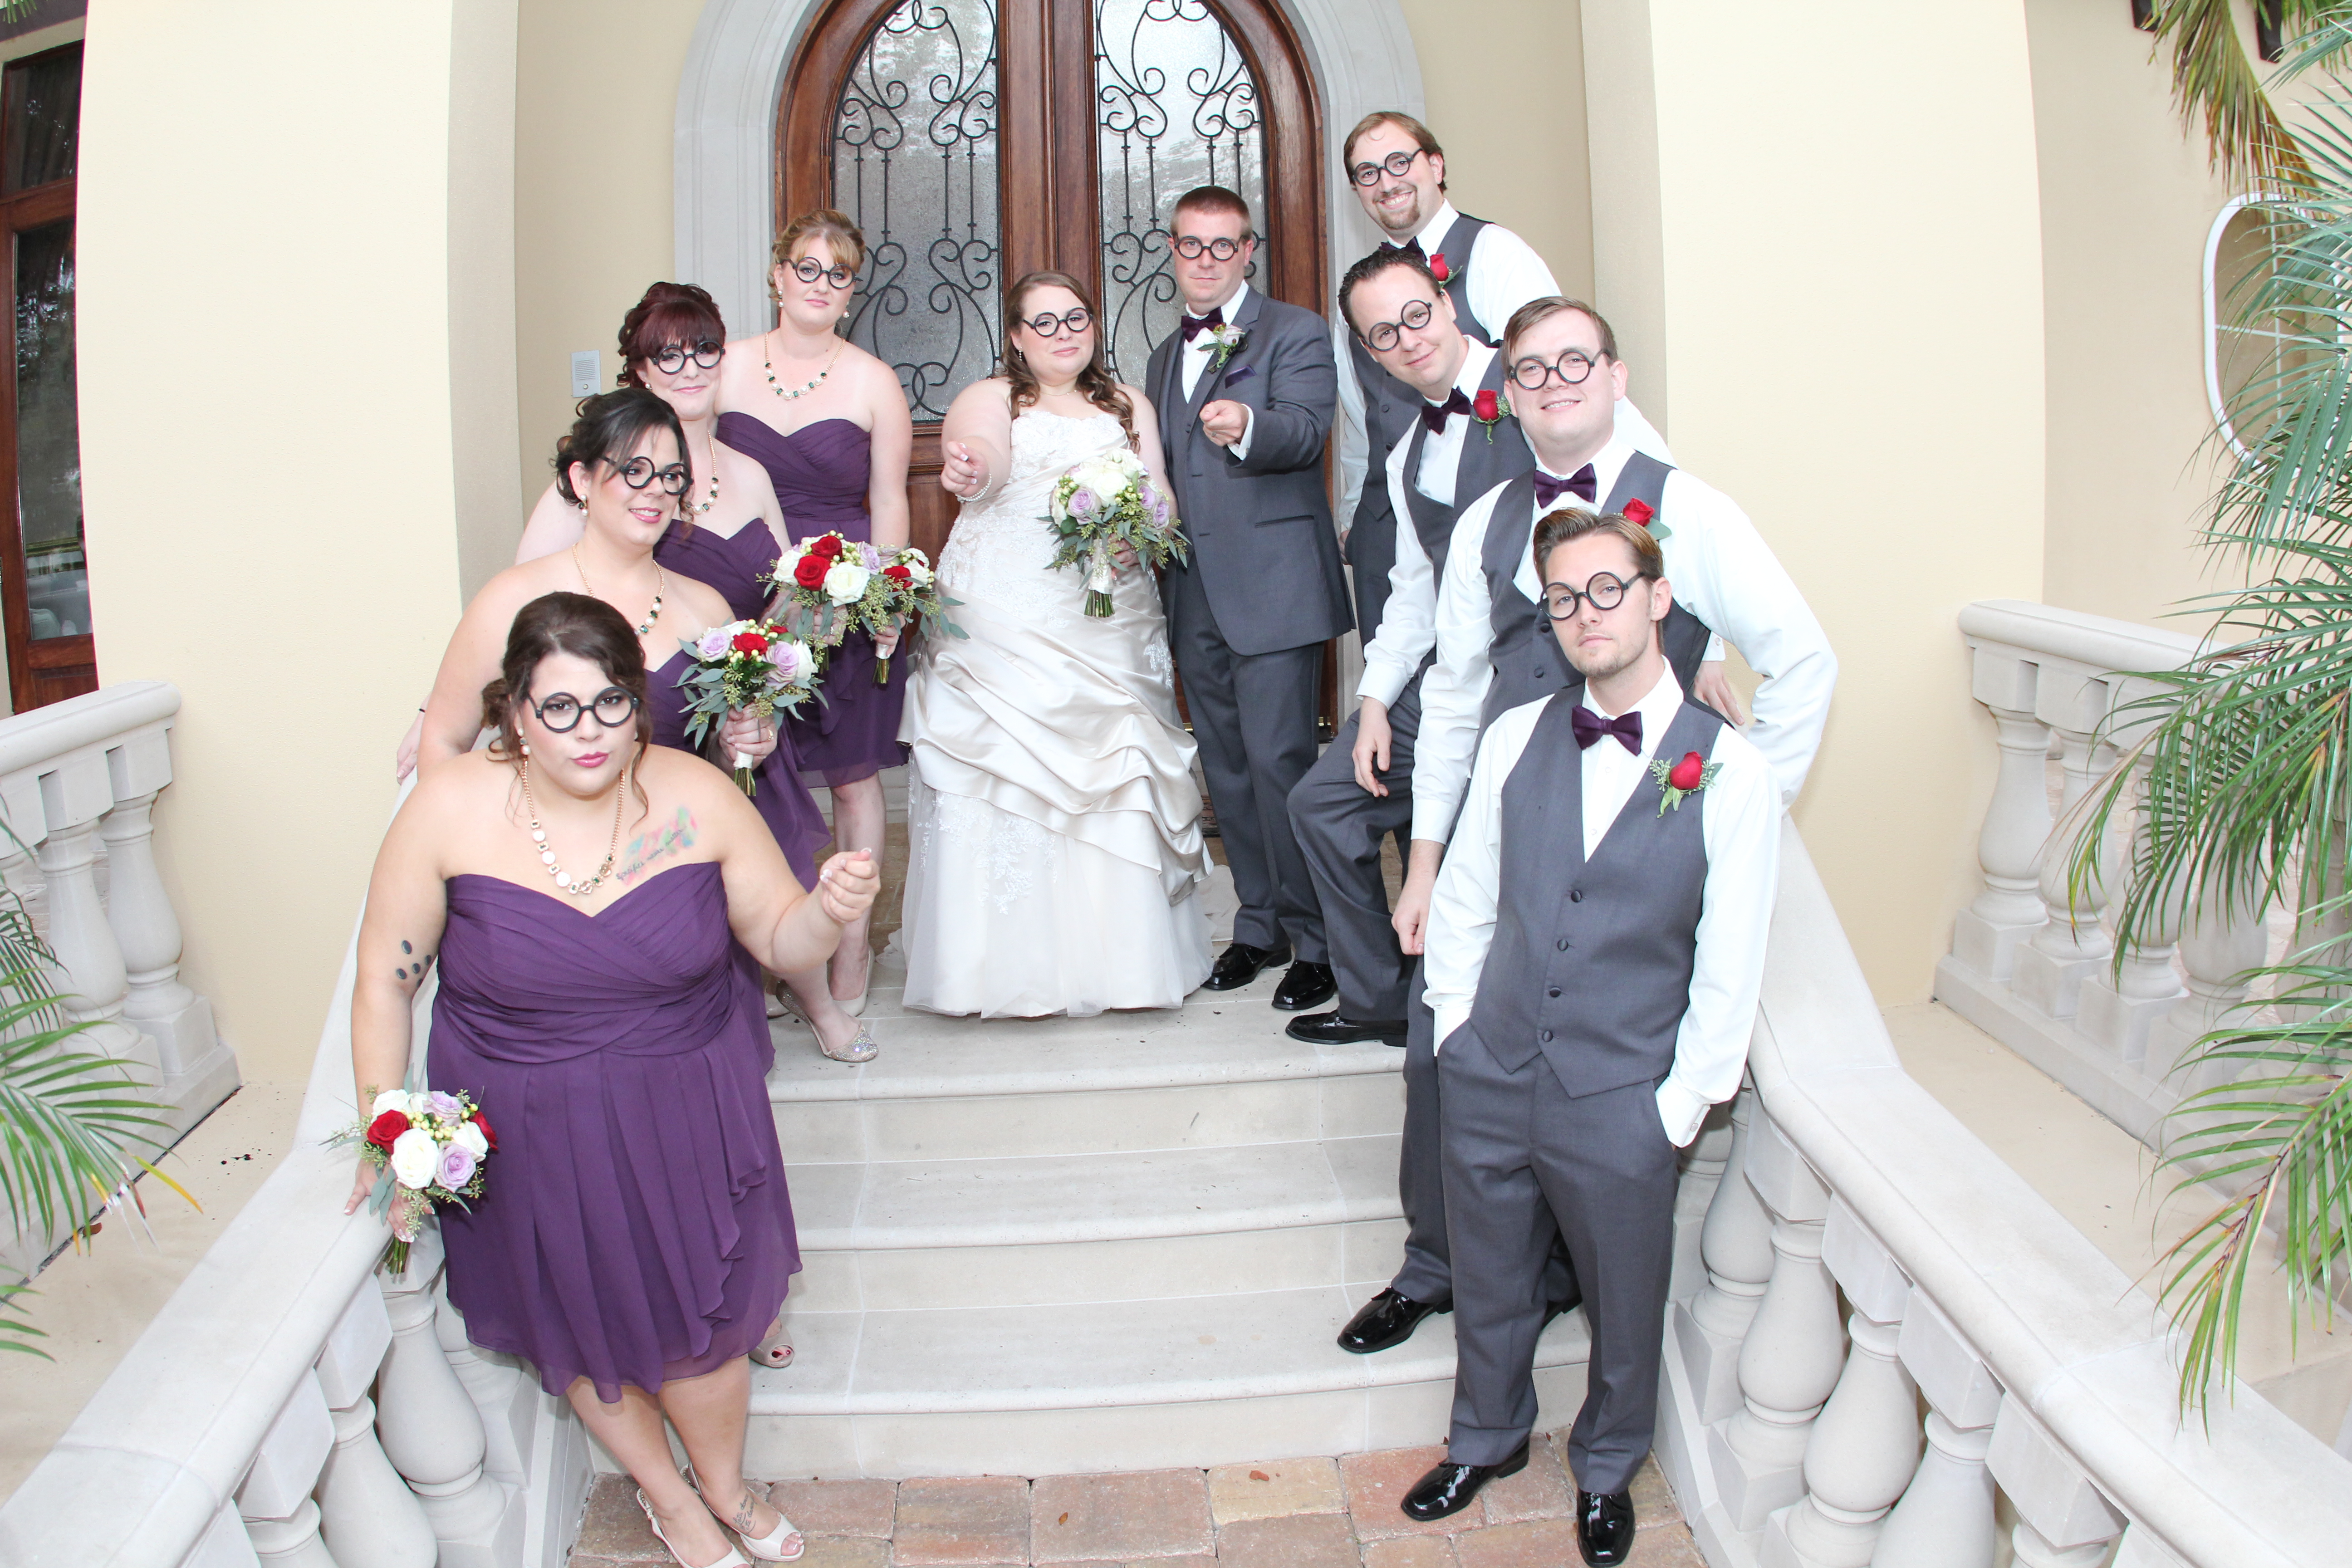 ... 9 - Wedding at Tampa Private Estate, UNIQUE Weddings & Events ...